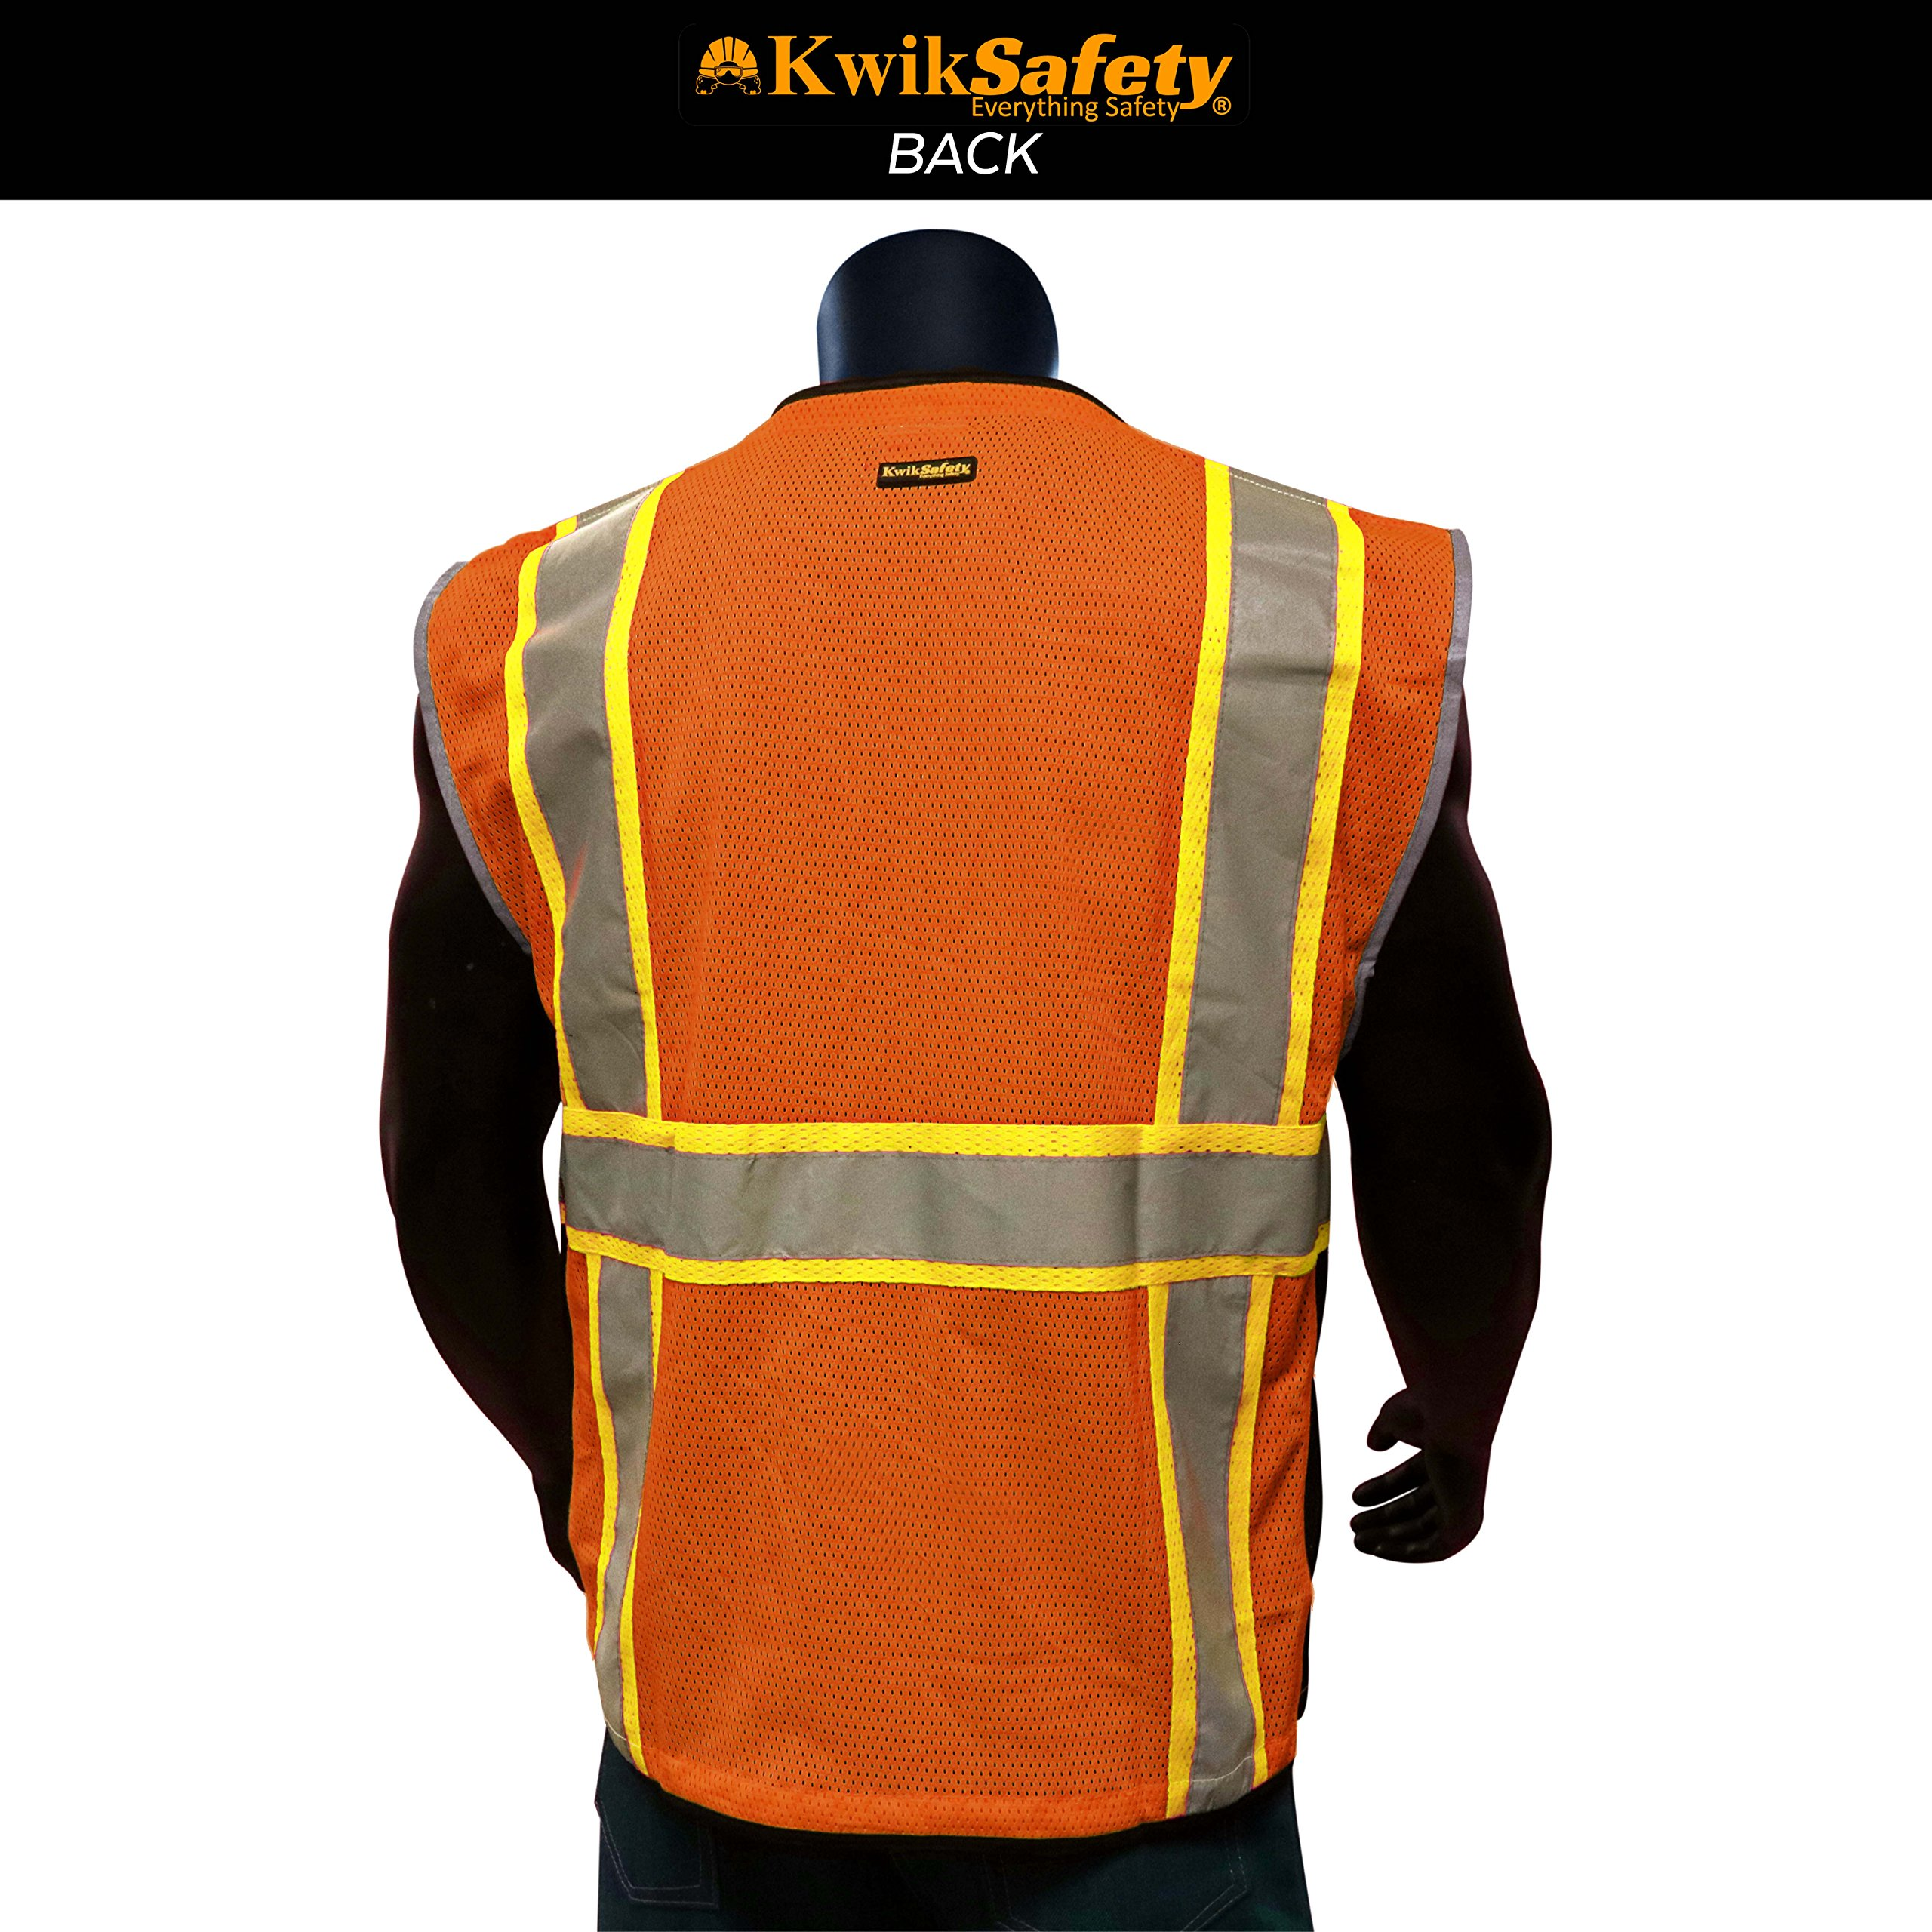 KwikSafety CLASSIC Safety Vest | Class 2 ANSI OSHA PPE | High Visibility Reflective Stripes, Heavy Duty Mesh with Pockets and Zipper | Hi-Vis Construction Work Hi-Vis Surveyor | Orange S/M by KwikSafety (Image #3)